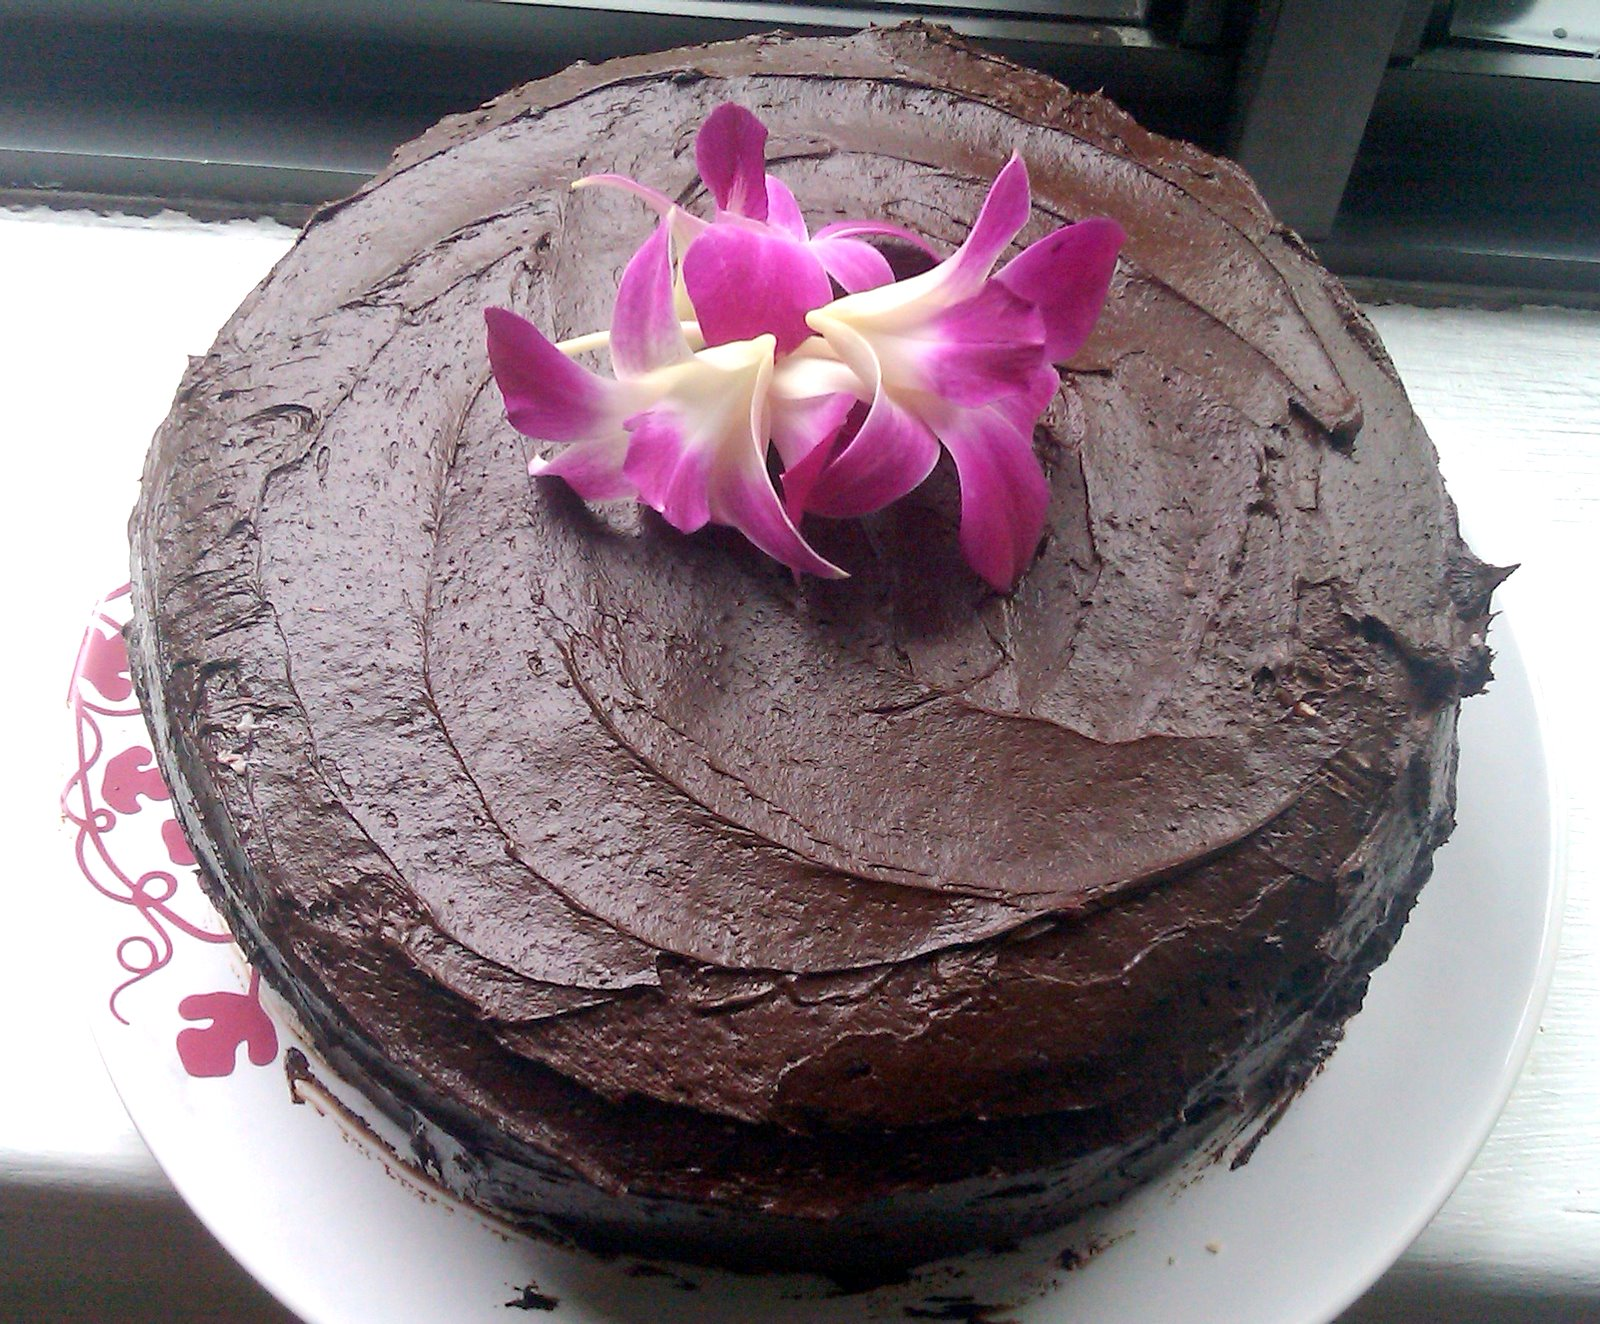 deli-cute-essen: Vegan Chocolate Cake with Strawberry Coconut Filling